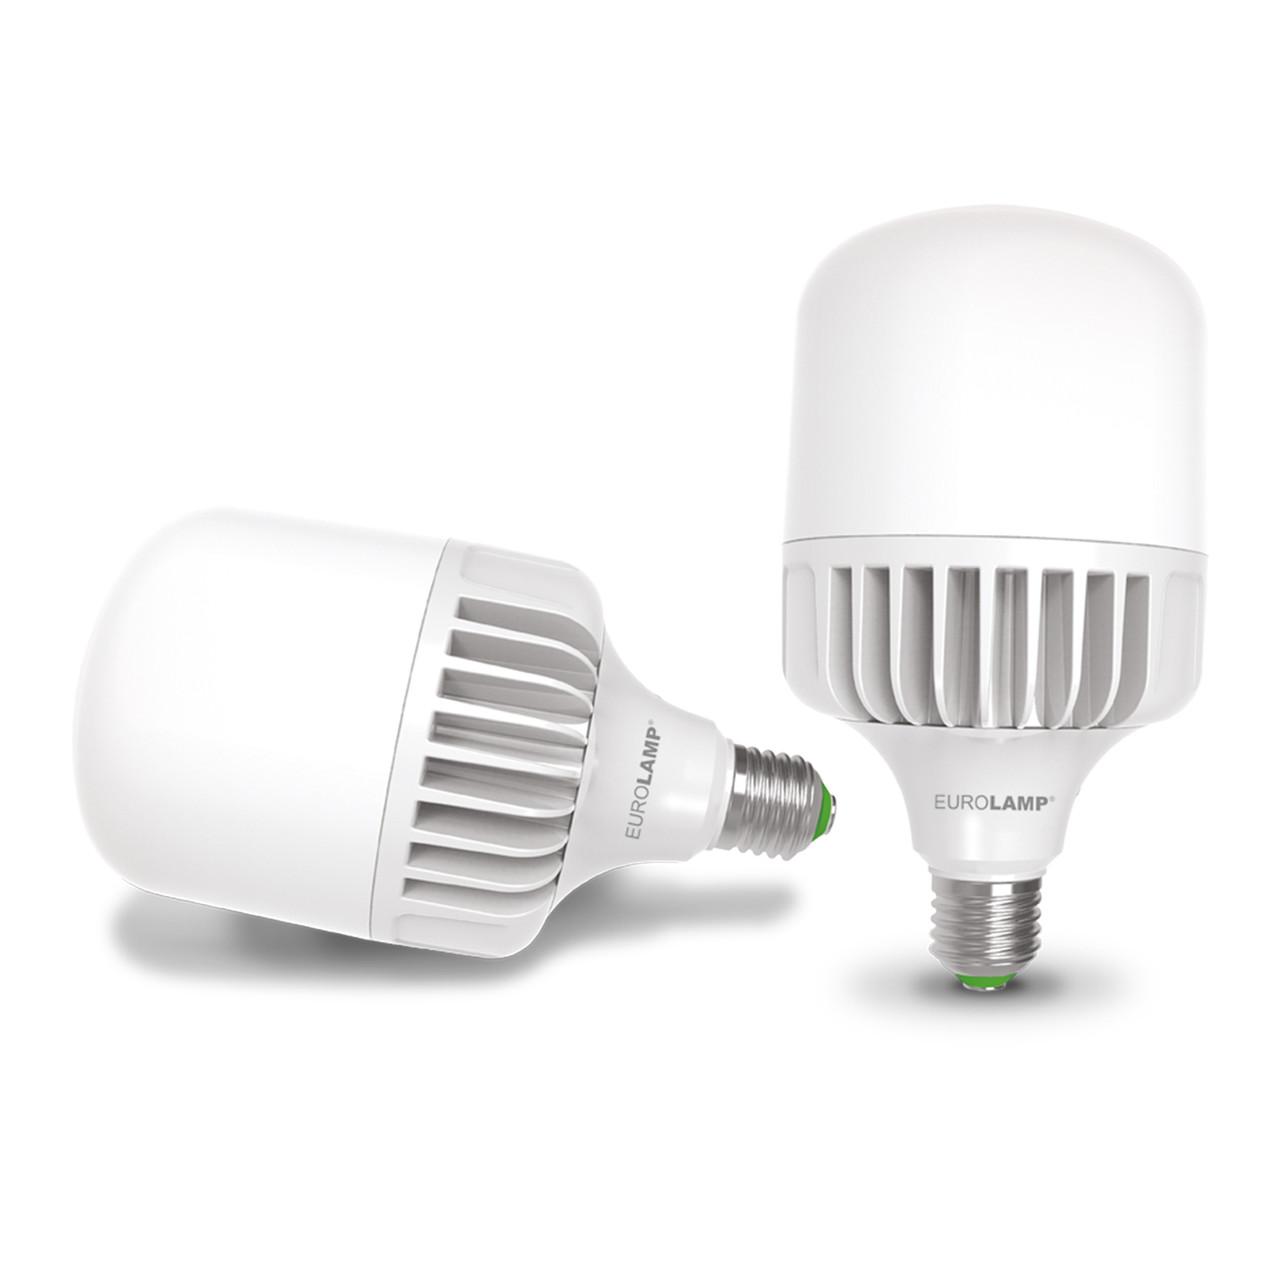 LED Лампа EUROLAMP високопотужна 30W E27 4000K